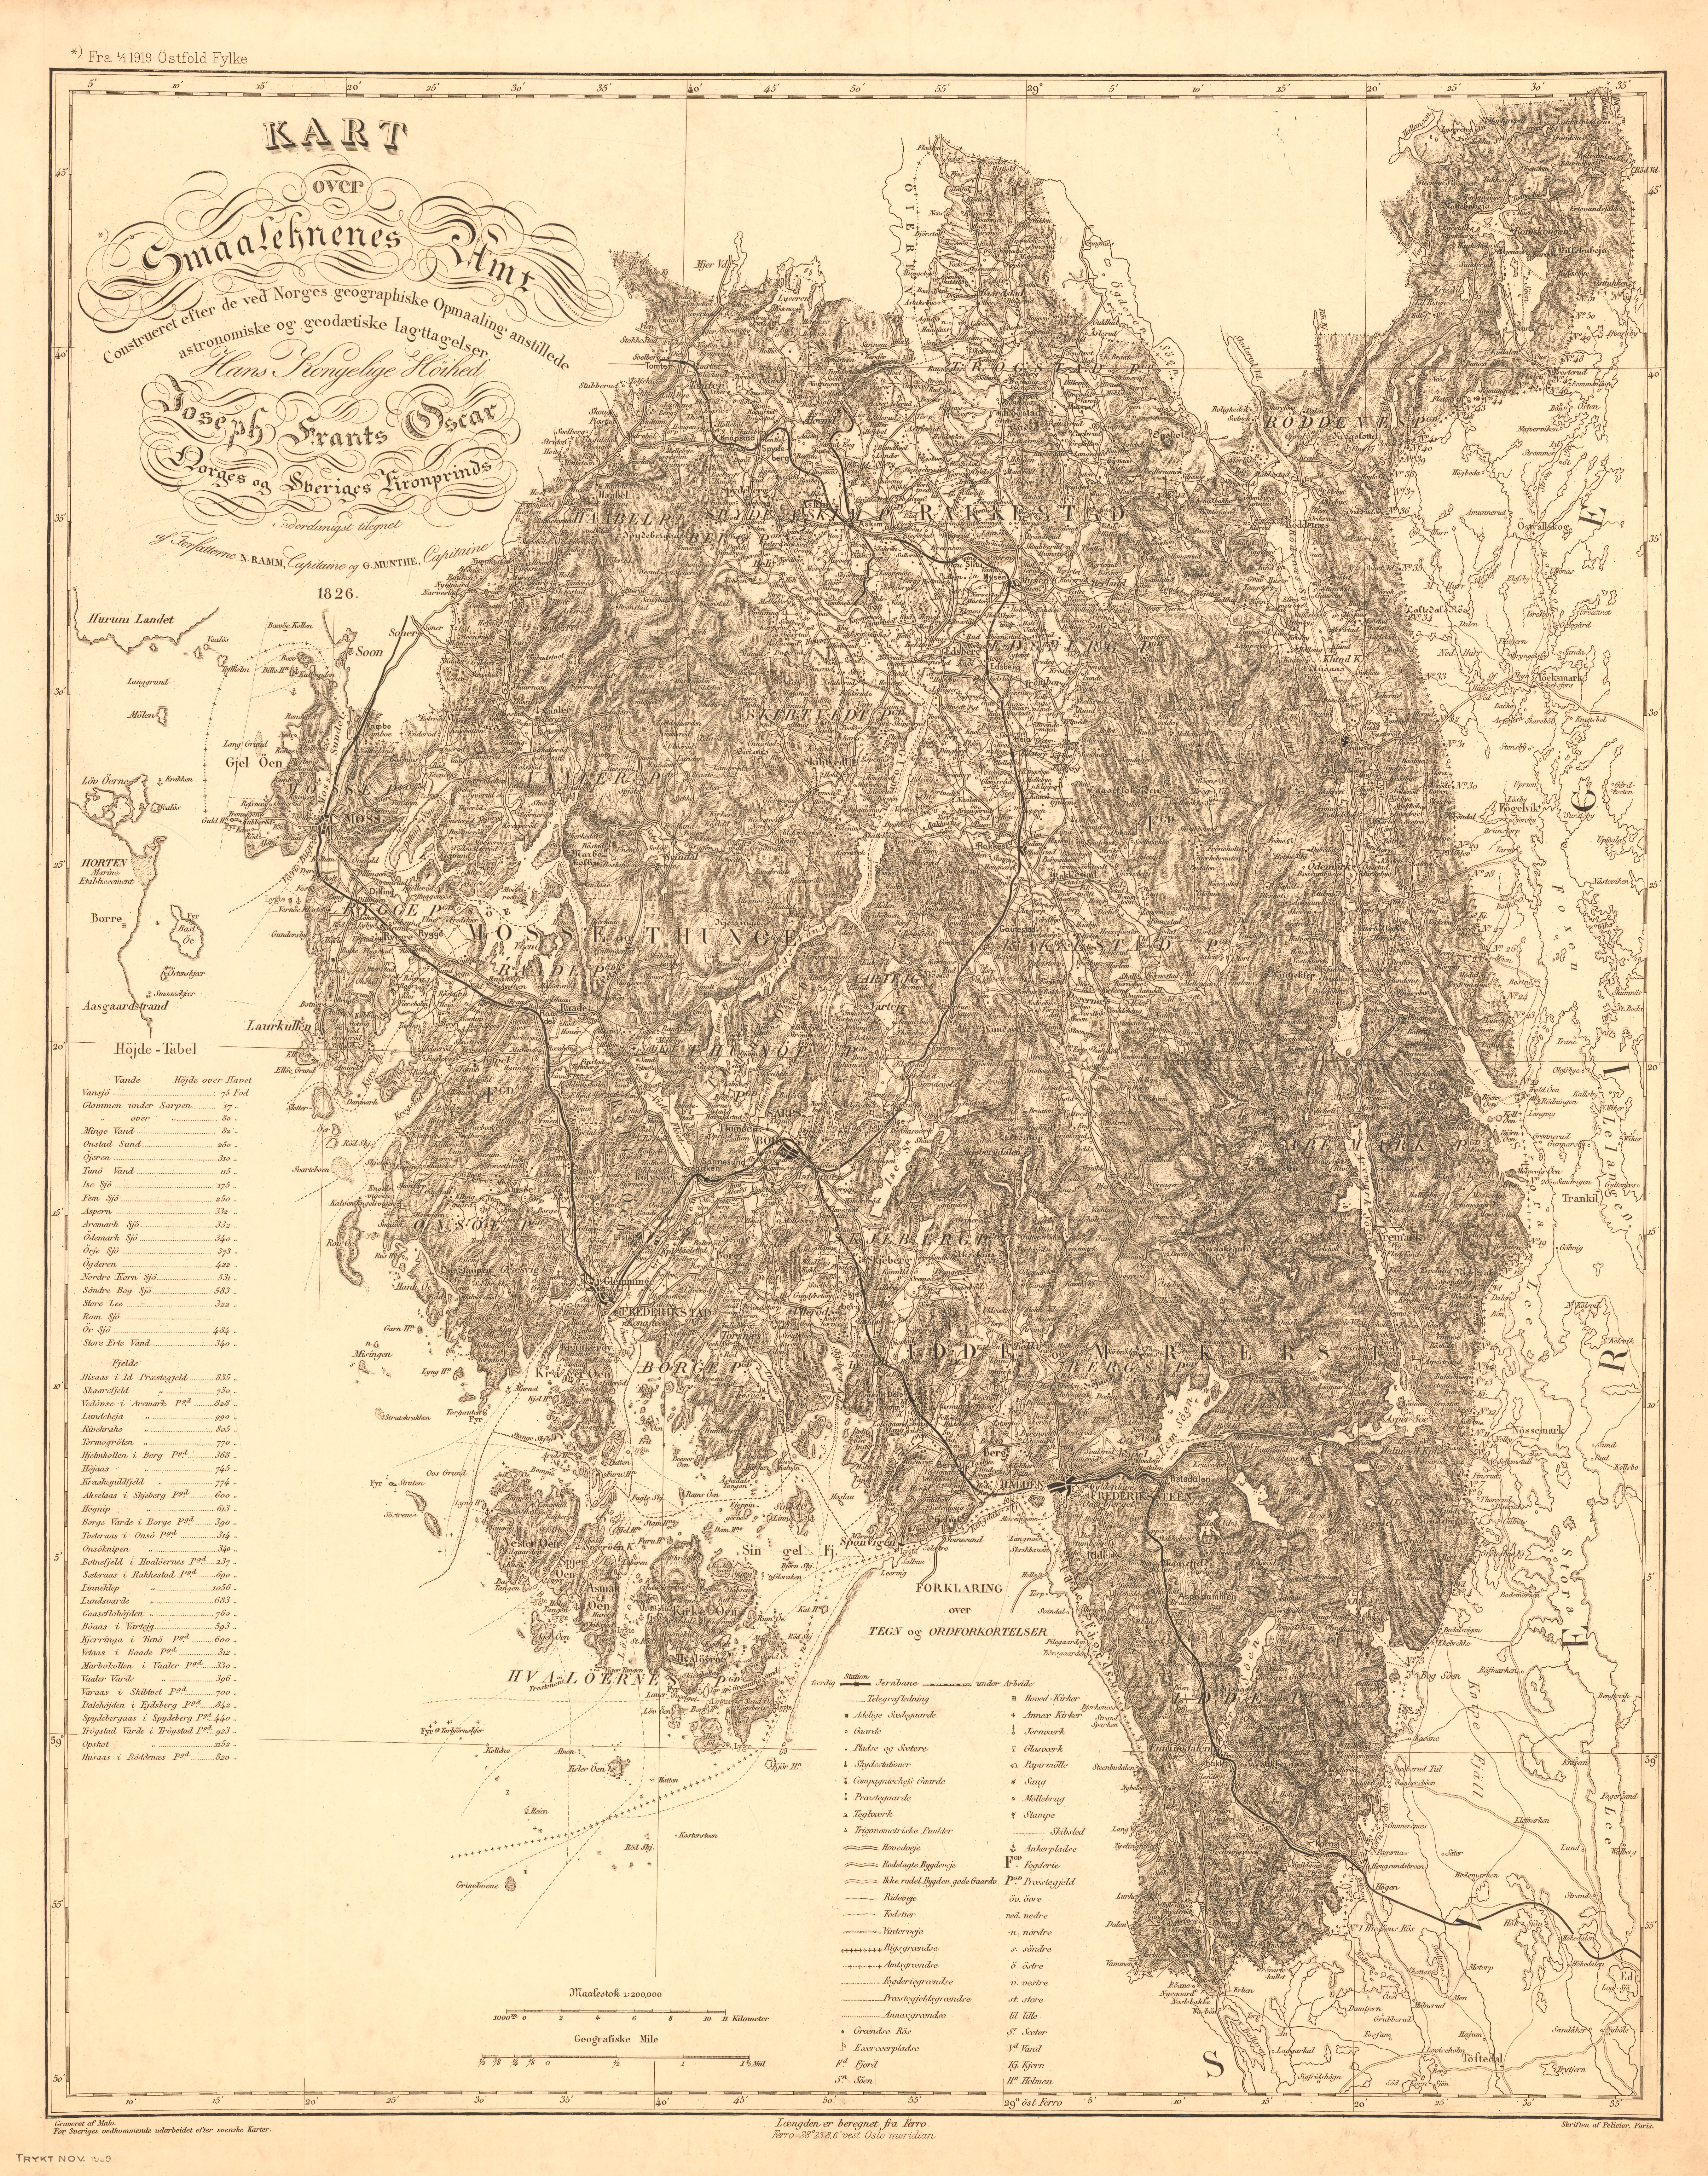 kart oppmåling File:Smålenenes amt nr 173  Kart over Smålenenes amt; constuert  kart oppmåling